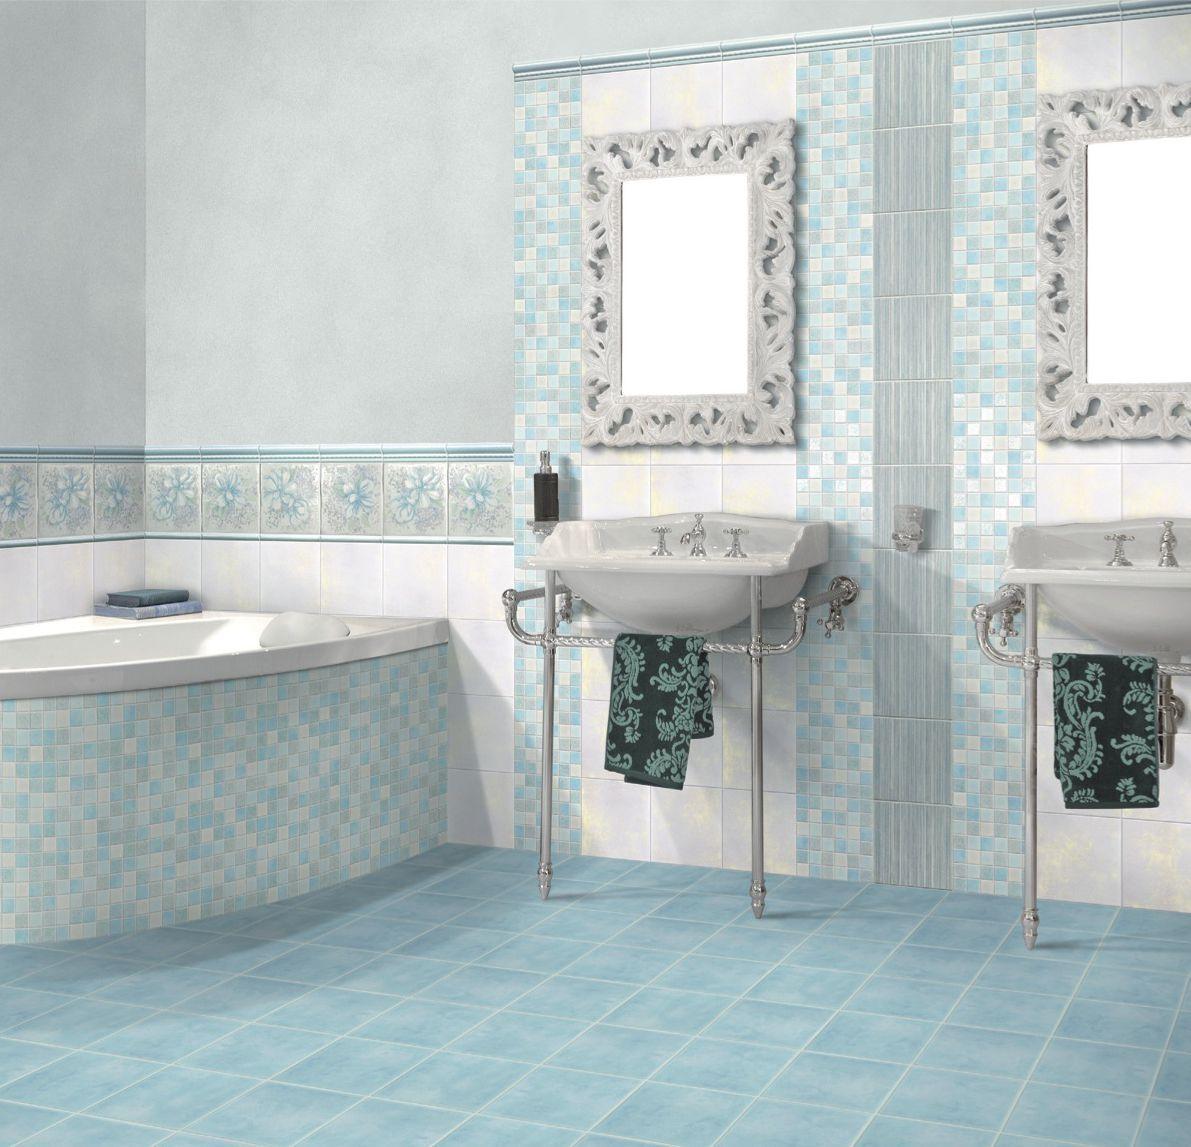 Bathroom tile / kitchen / wall / ceramic - DELIZIE - CERAMICA ALTA